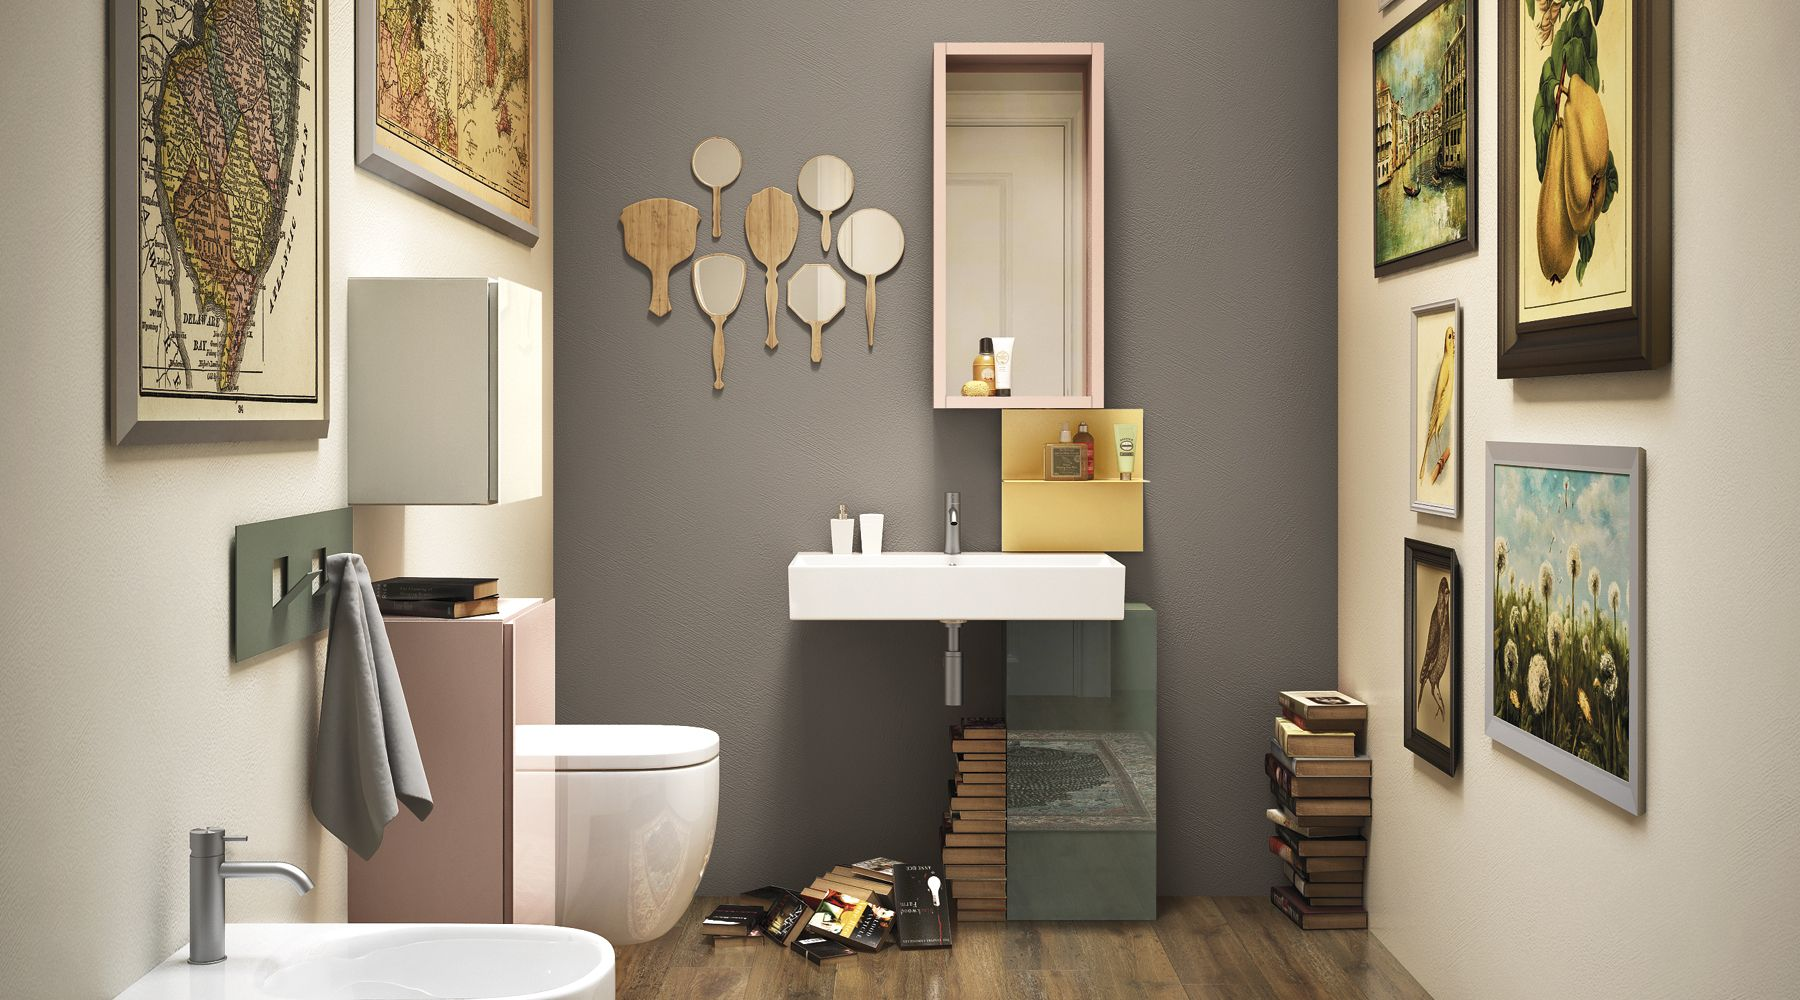 Basica Basin Bathroom Interiordesign Furniture Home